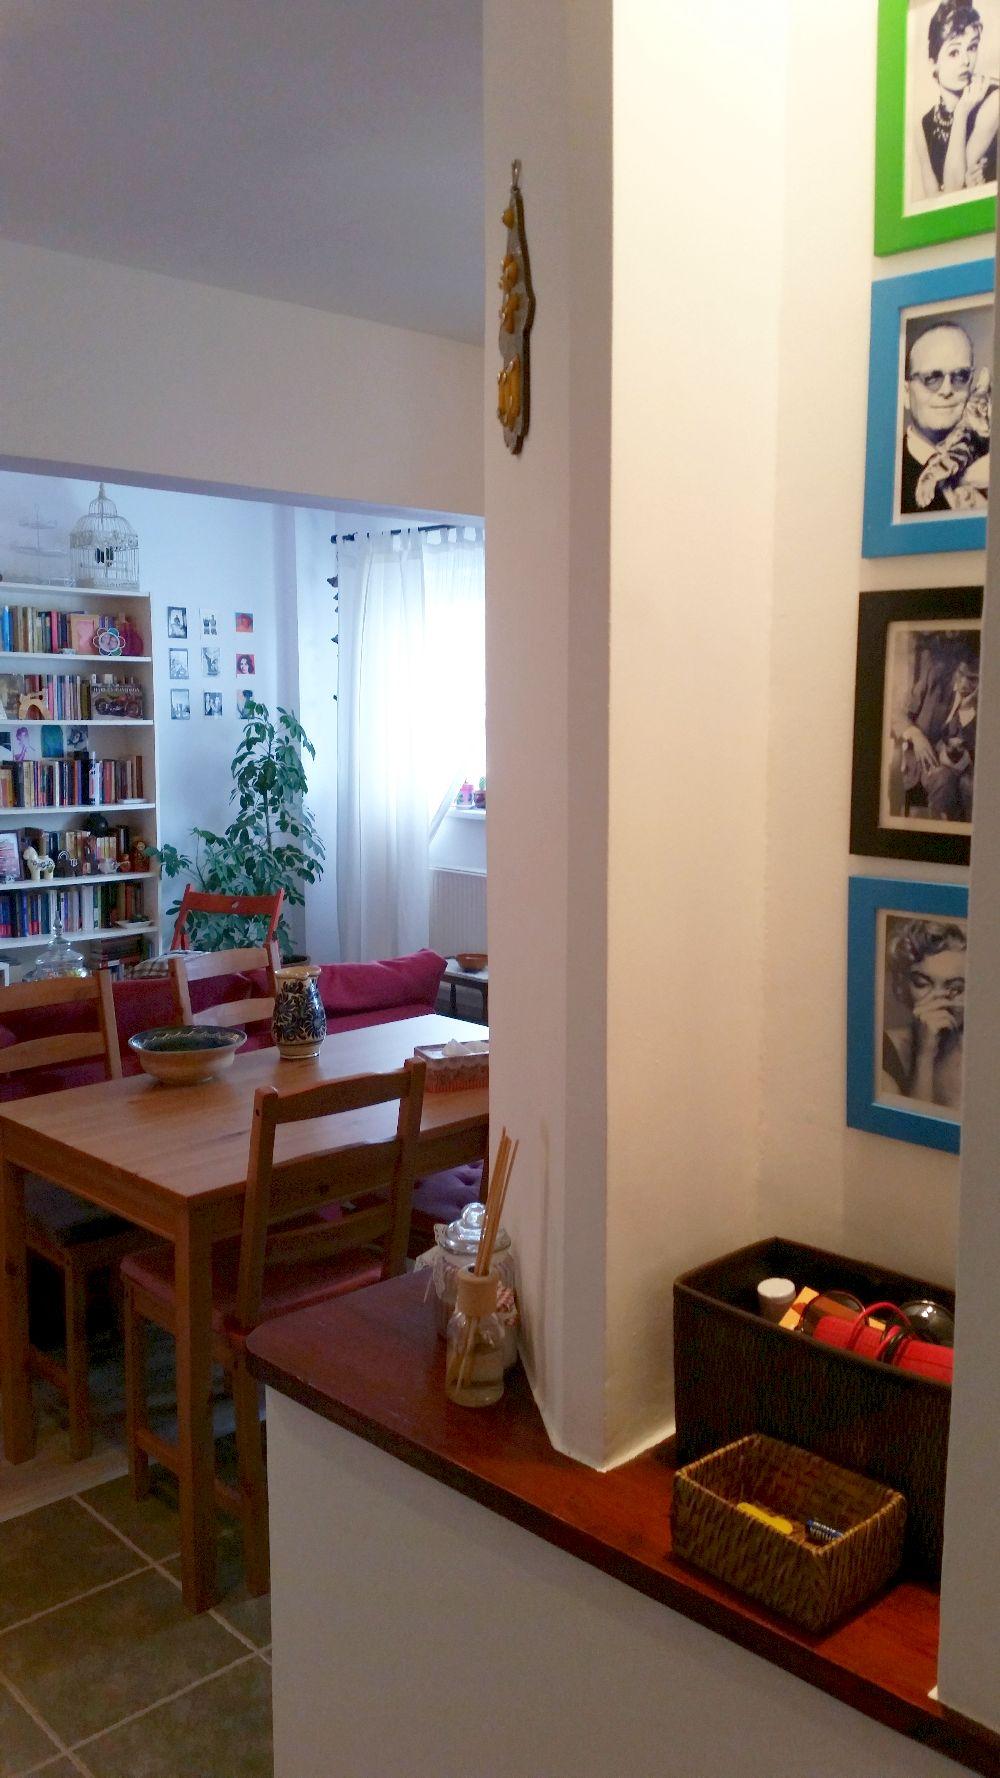 adelaparvu.com despre apartament 3 camere colorat in Sibiu, Foto Adela Parvu (32)